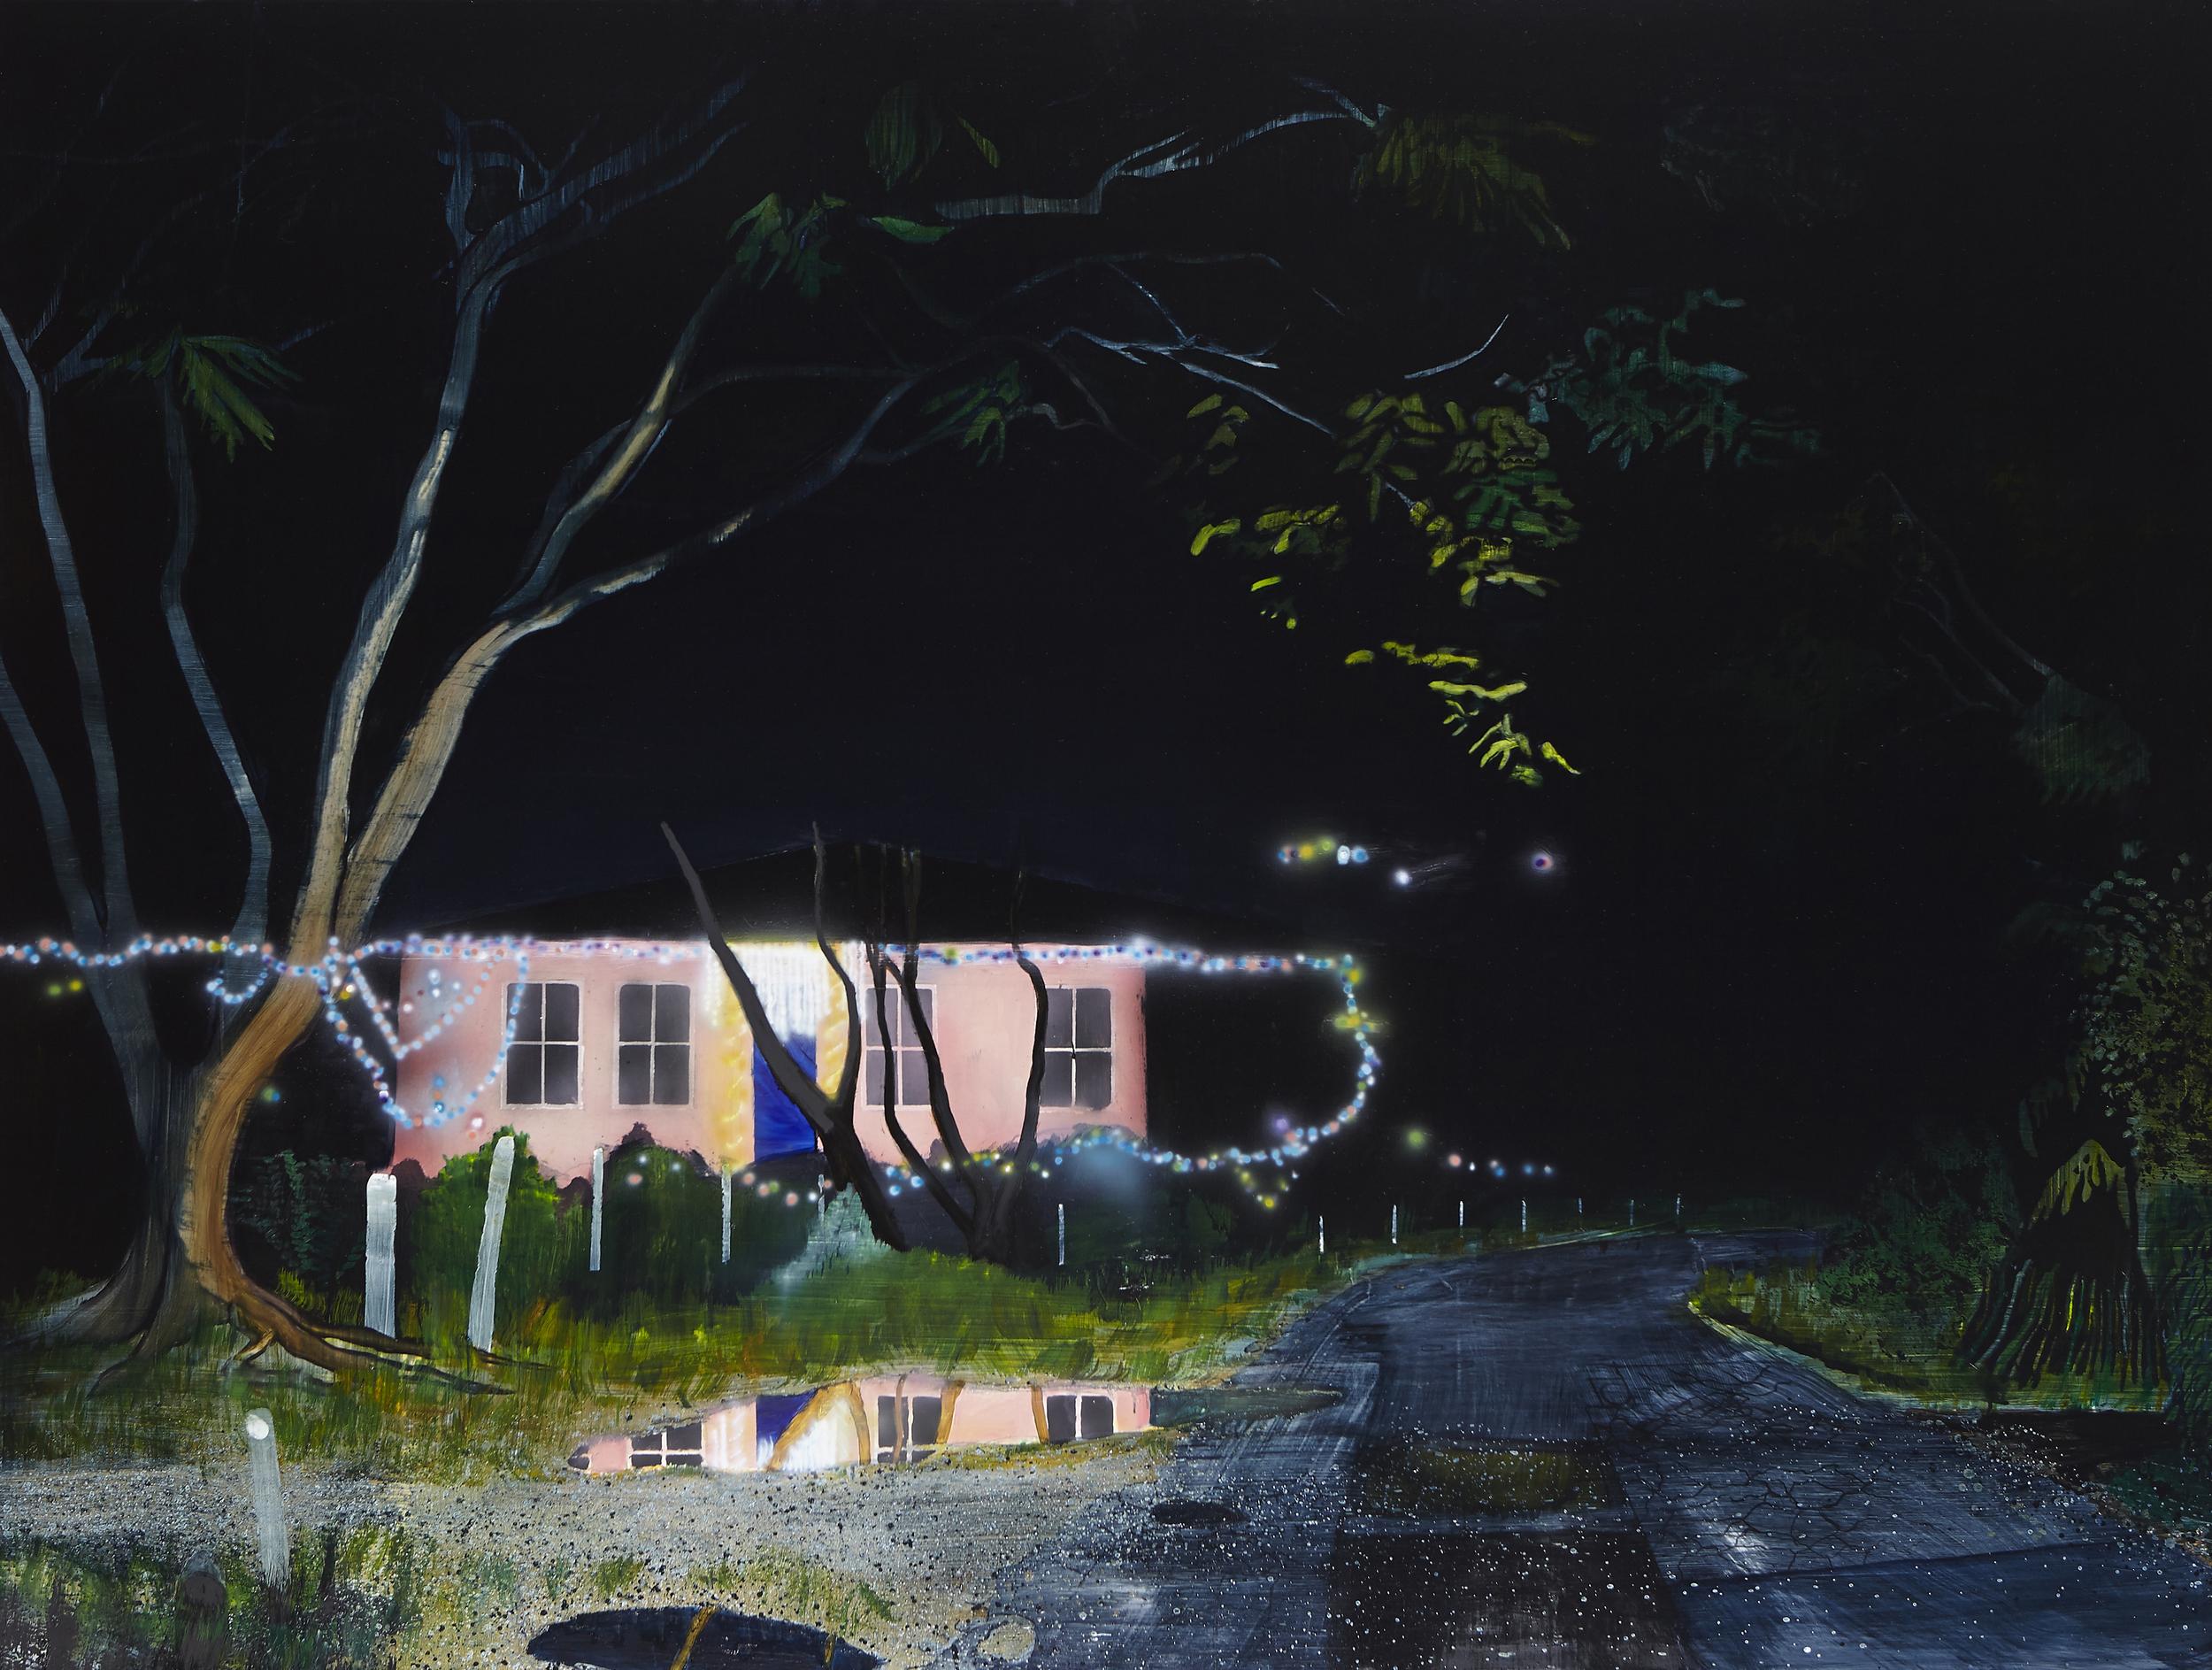 Crossroads,  2014 Acrylic, oil and enamel on linen 150 x 200cm